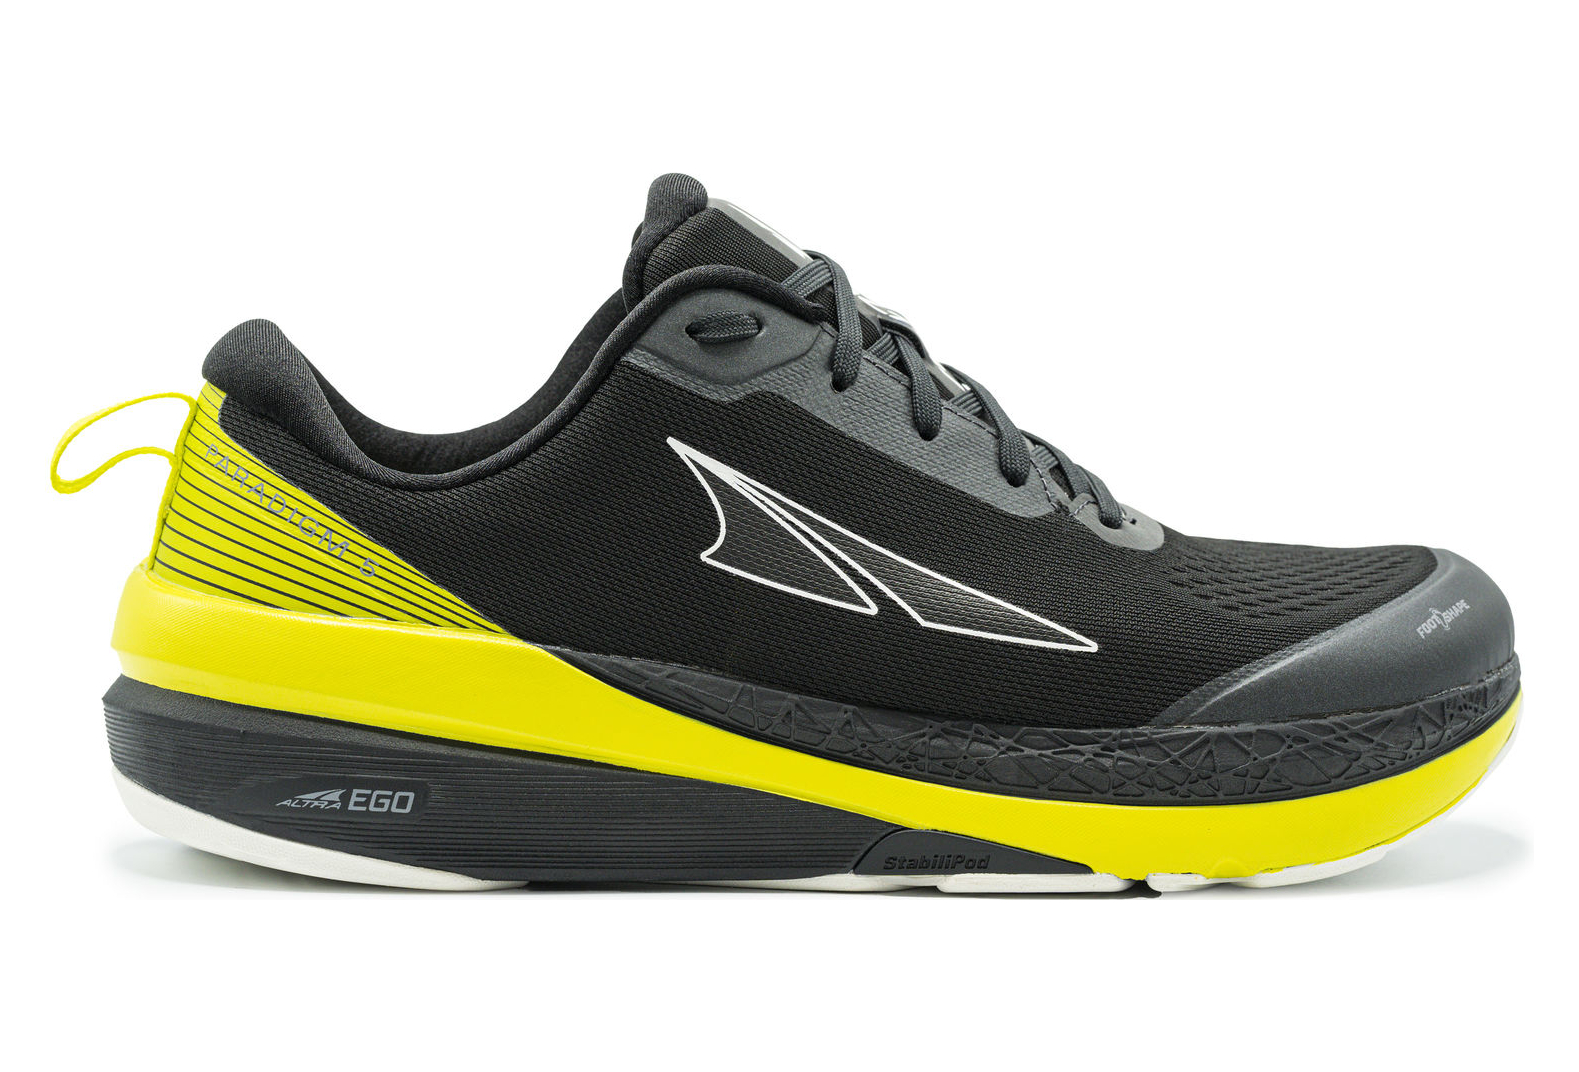 Altra Paradigm 5 Shoes Black Yellow Men